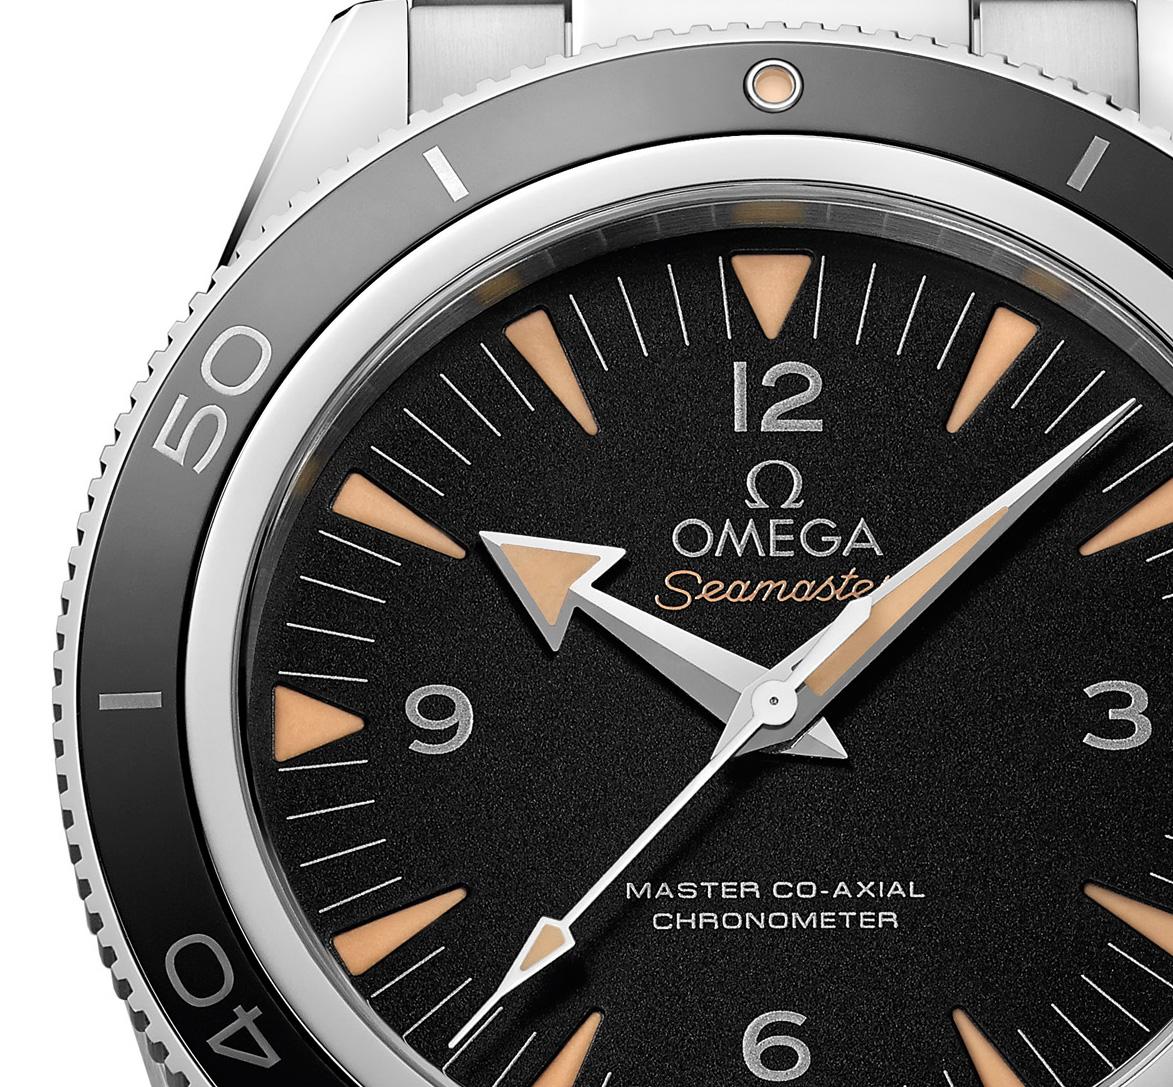 Omega-Seamaster-300-Master-Co-Axial-Baselworld-2014-281291